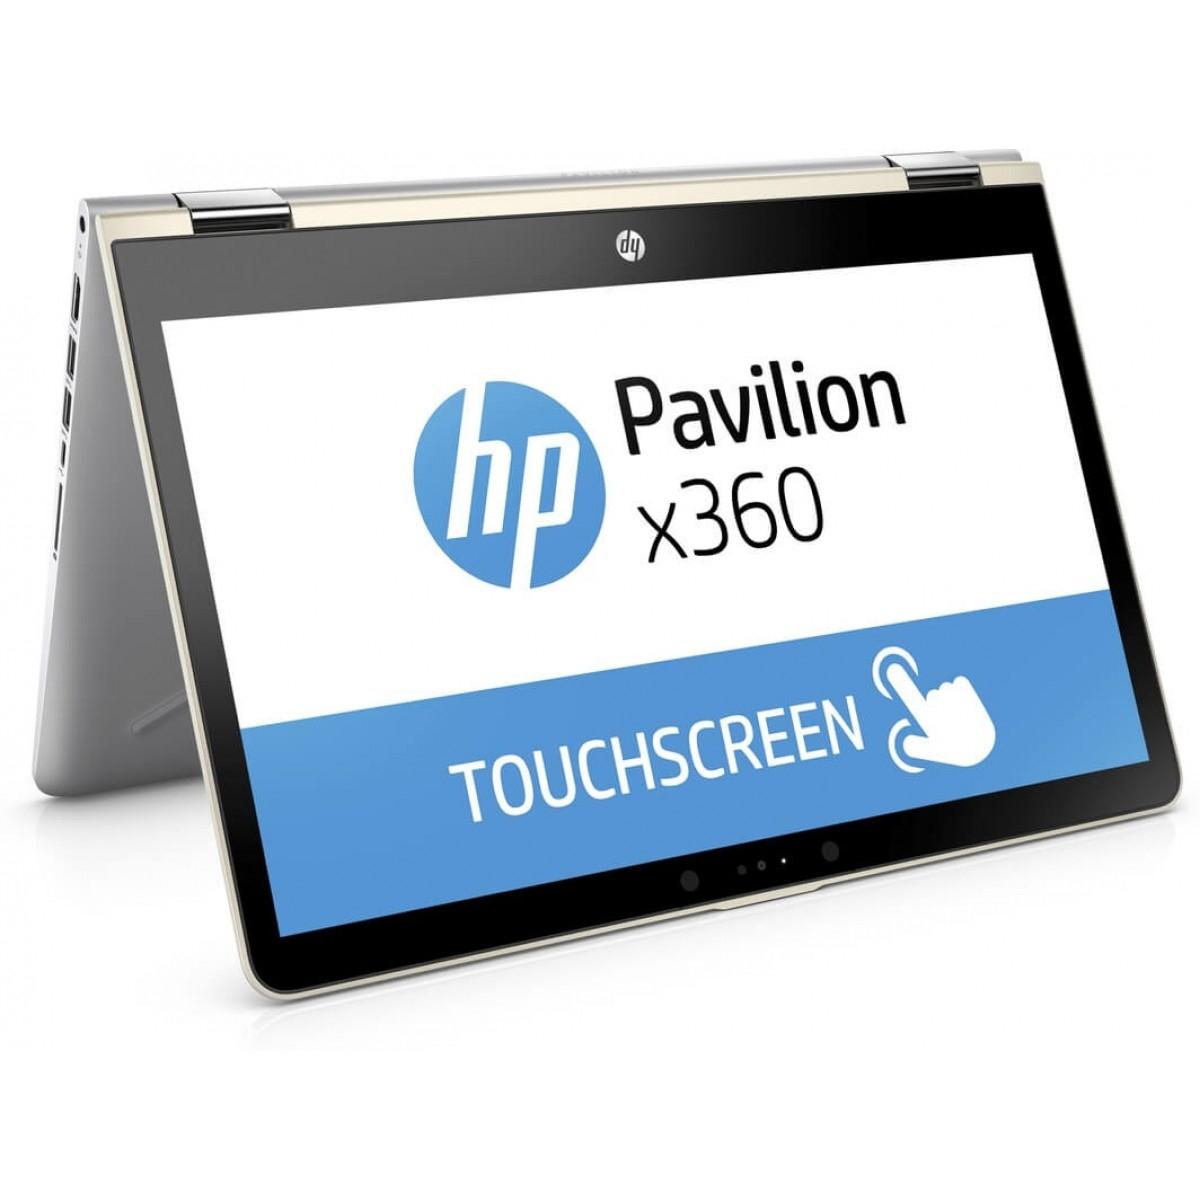 HP Pavilion x360 14 inch laptop (i3, 128GB SSD, touchscreen)